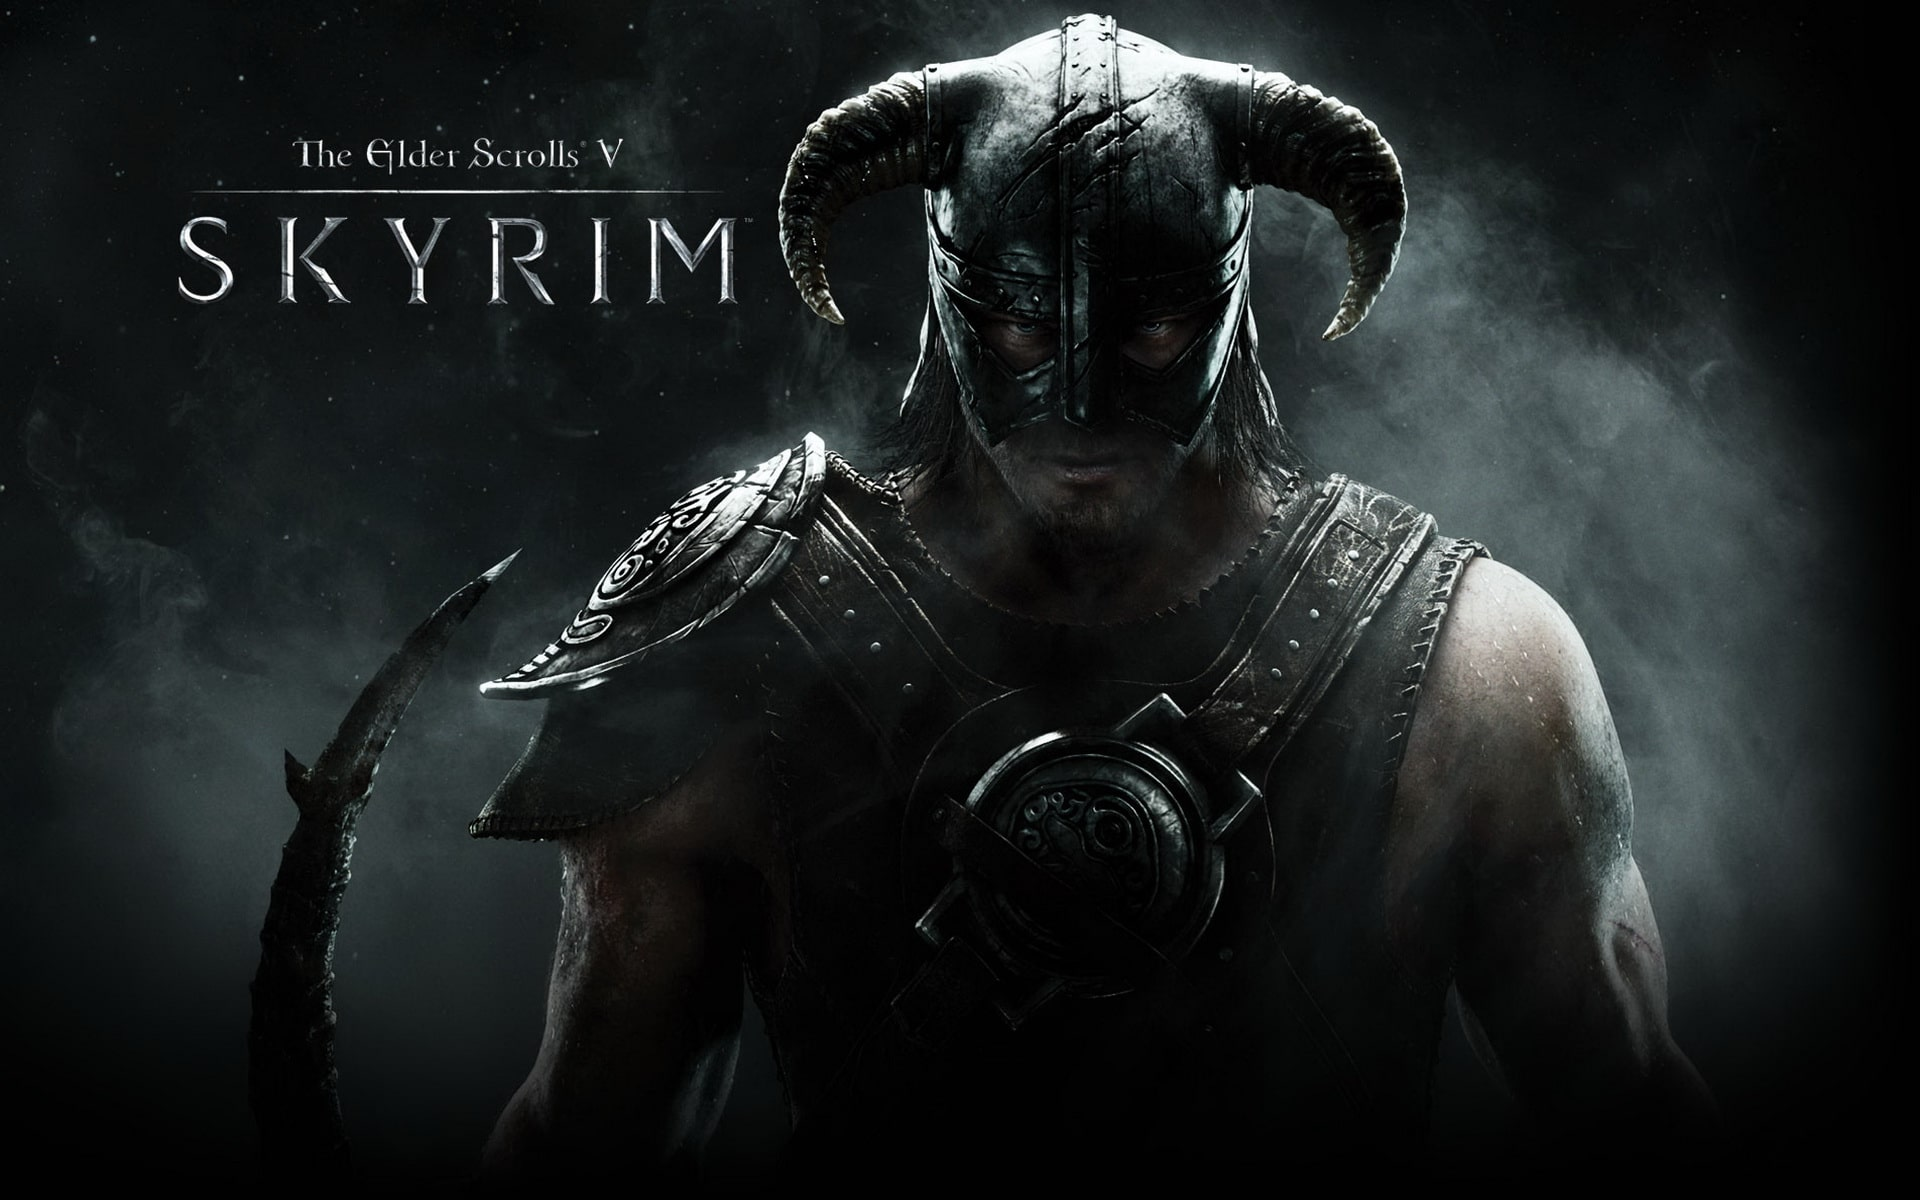 Skyrim Mod agrega a Lady Dimitrescu al juego, GamersRD